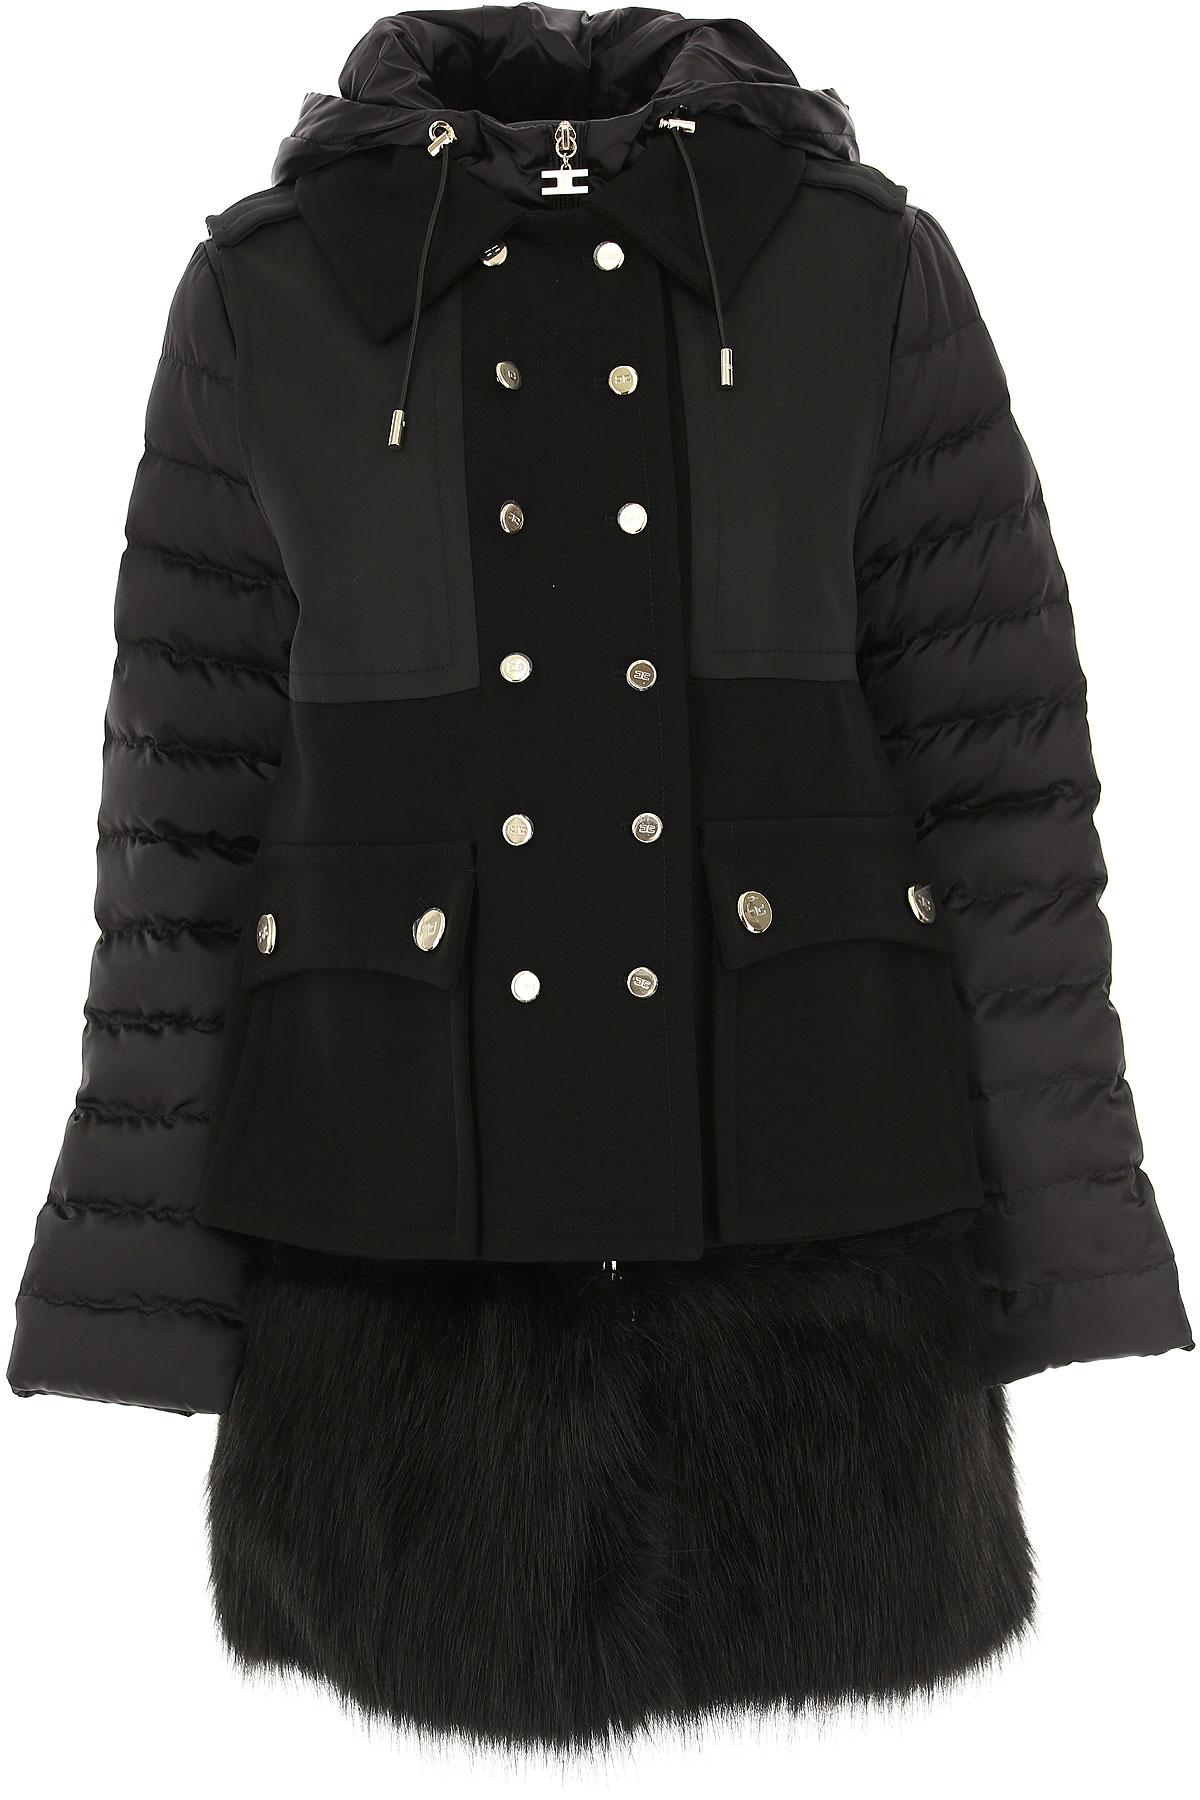 Image of Elisabetta Franchi Down Jacket for Women, Puffer Ski Jacket, Black, polyester, 2017, 28 4 6 8